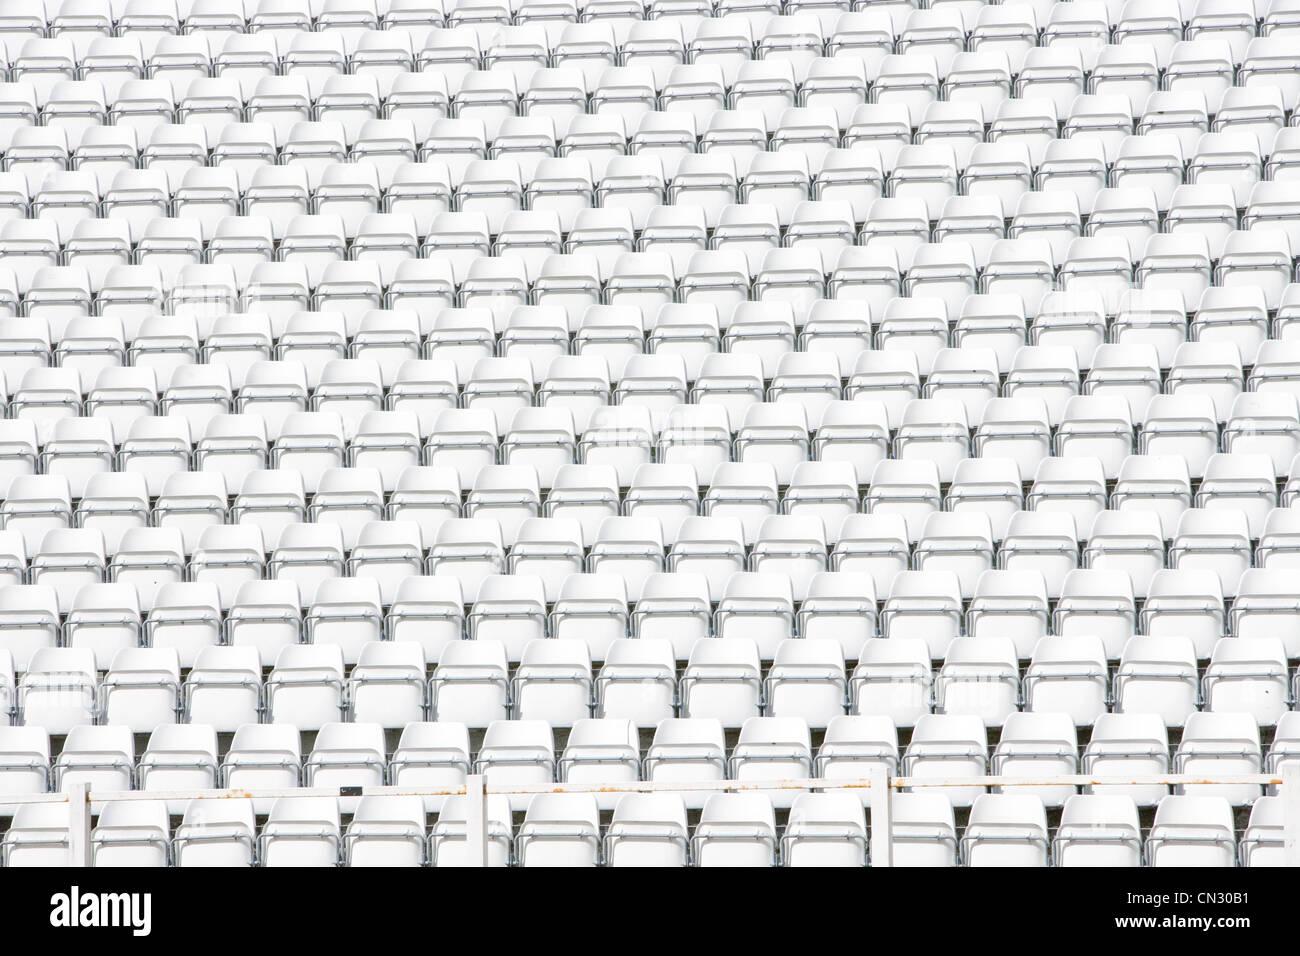 Empty stadium seats, full frame - Stock Image